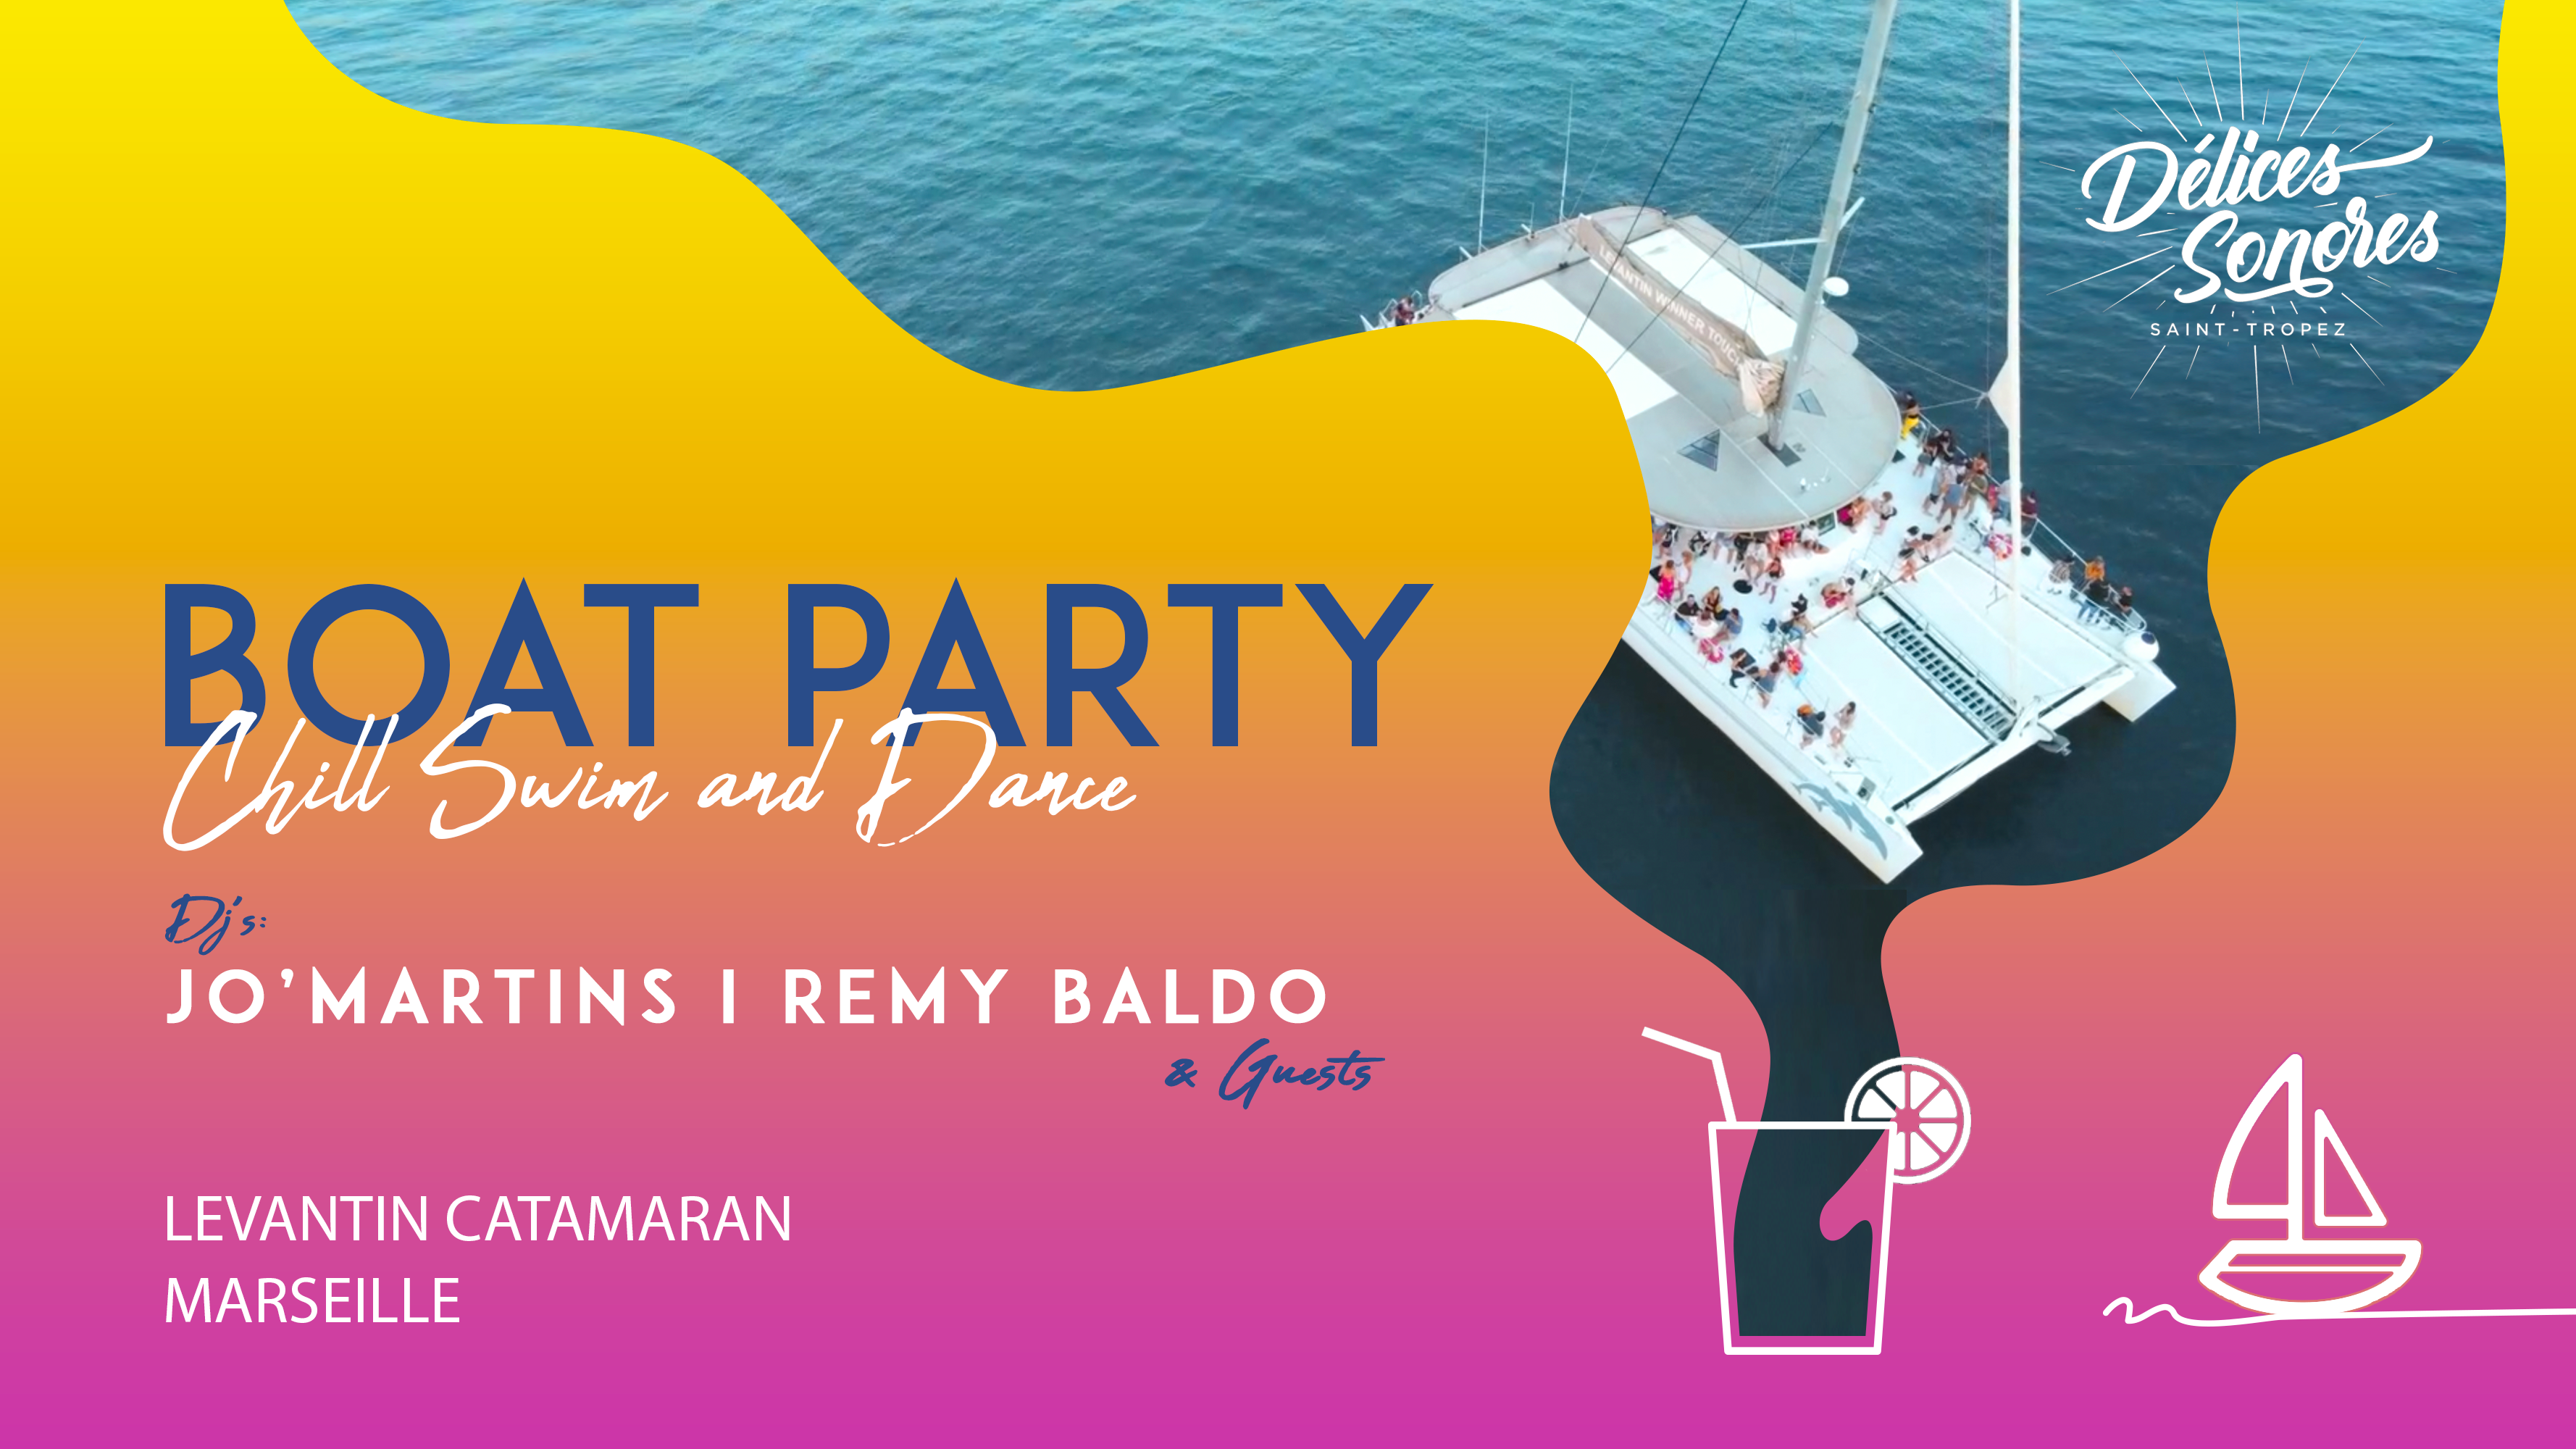 Delices Sonores Boat Party 2021